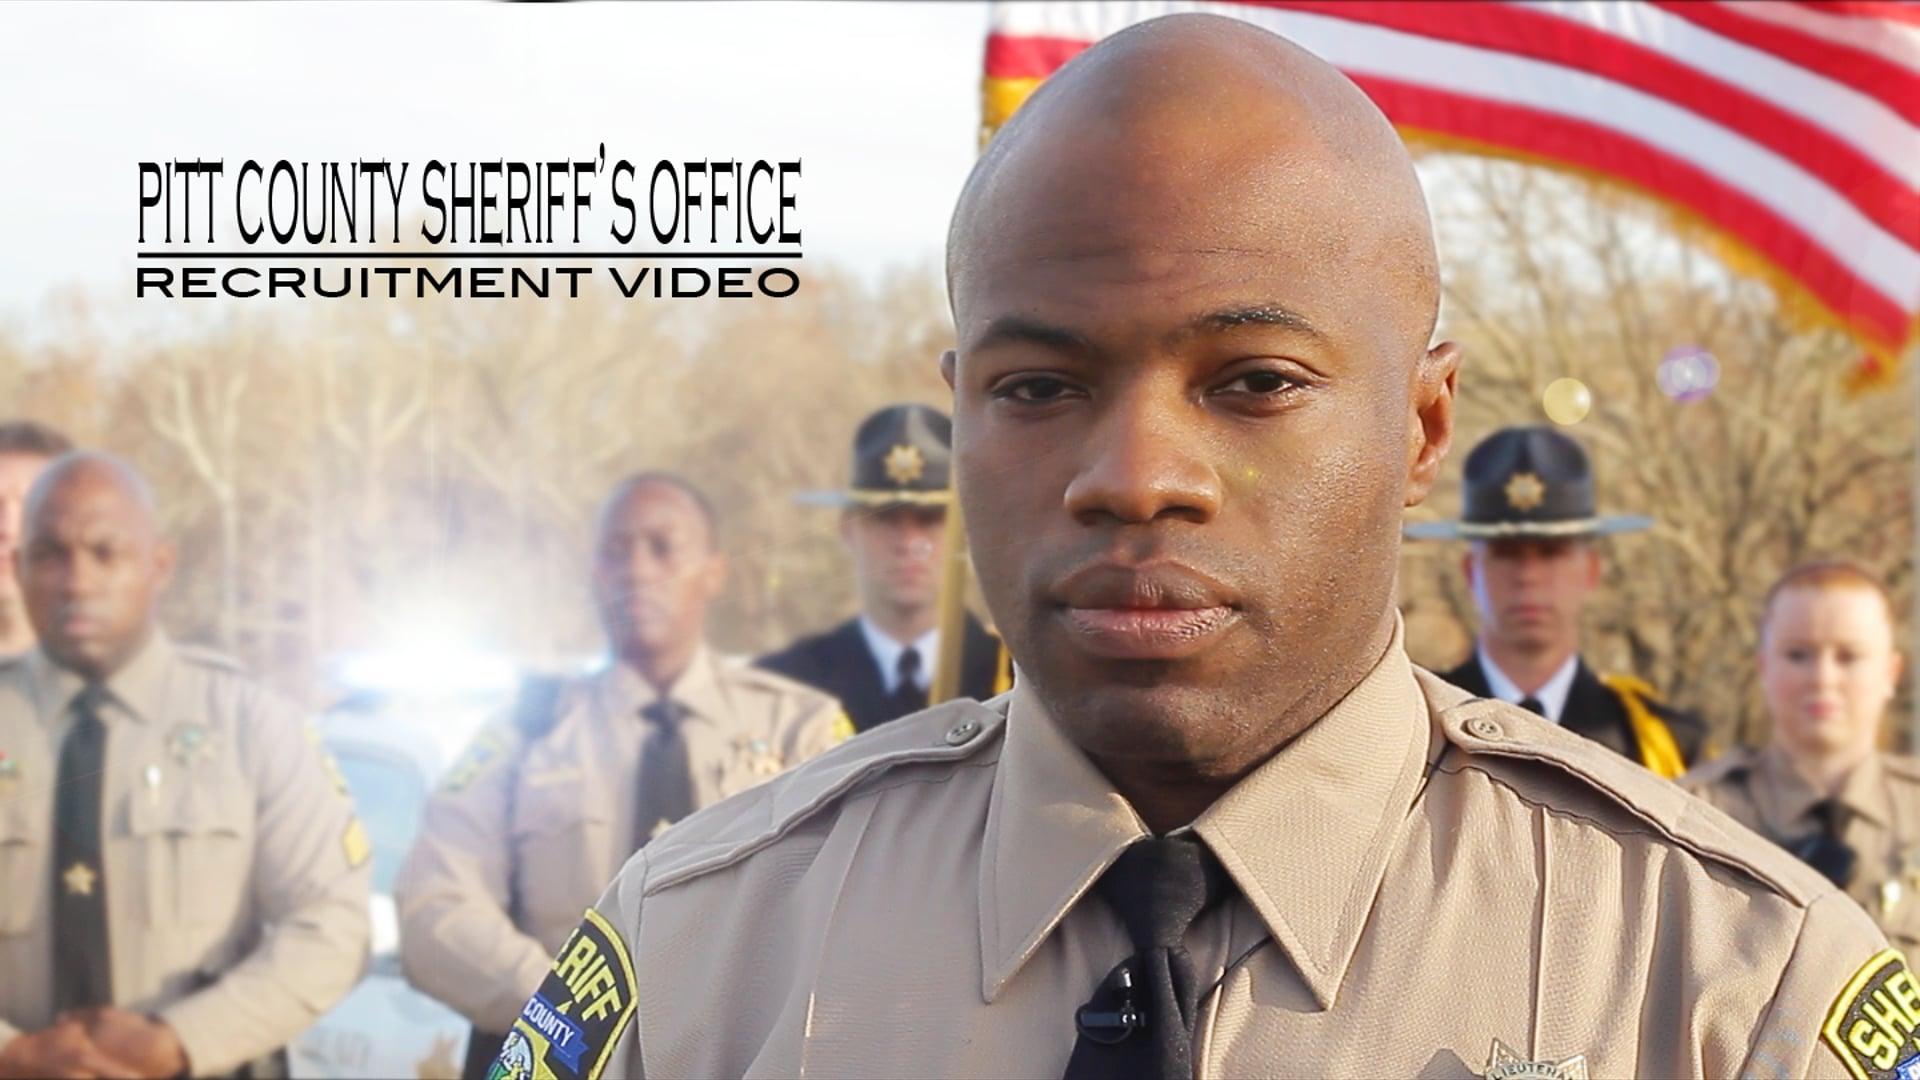 Pitt County Sheriff's Office Recruitment